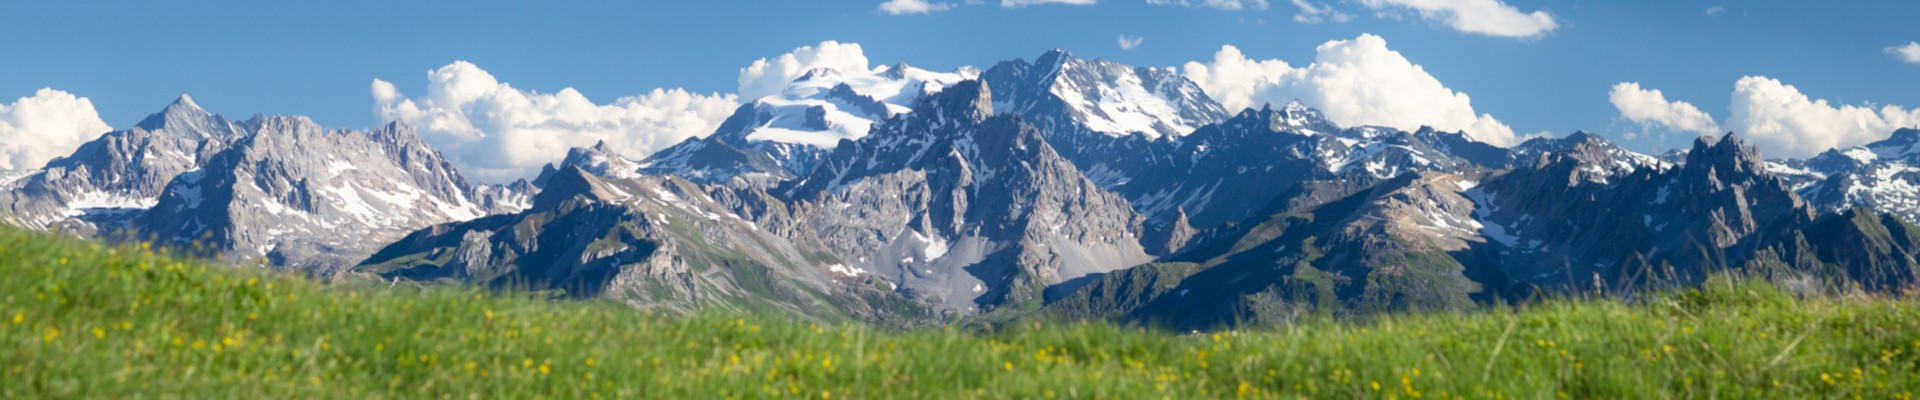 Sites naturels remarquables Vallée de Bozel